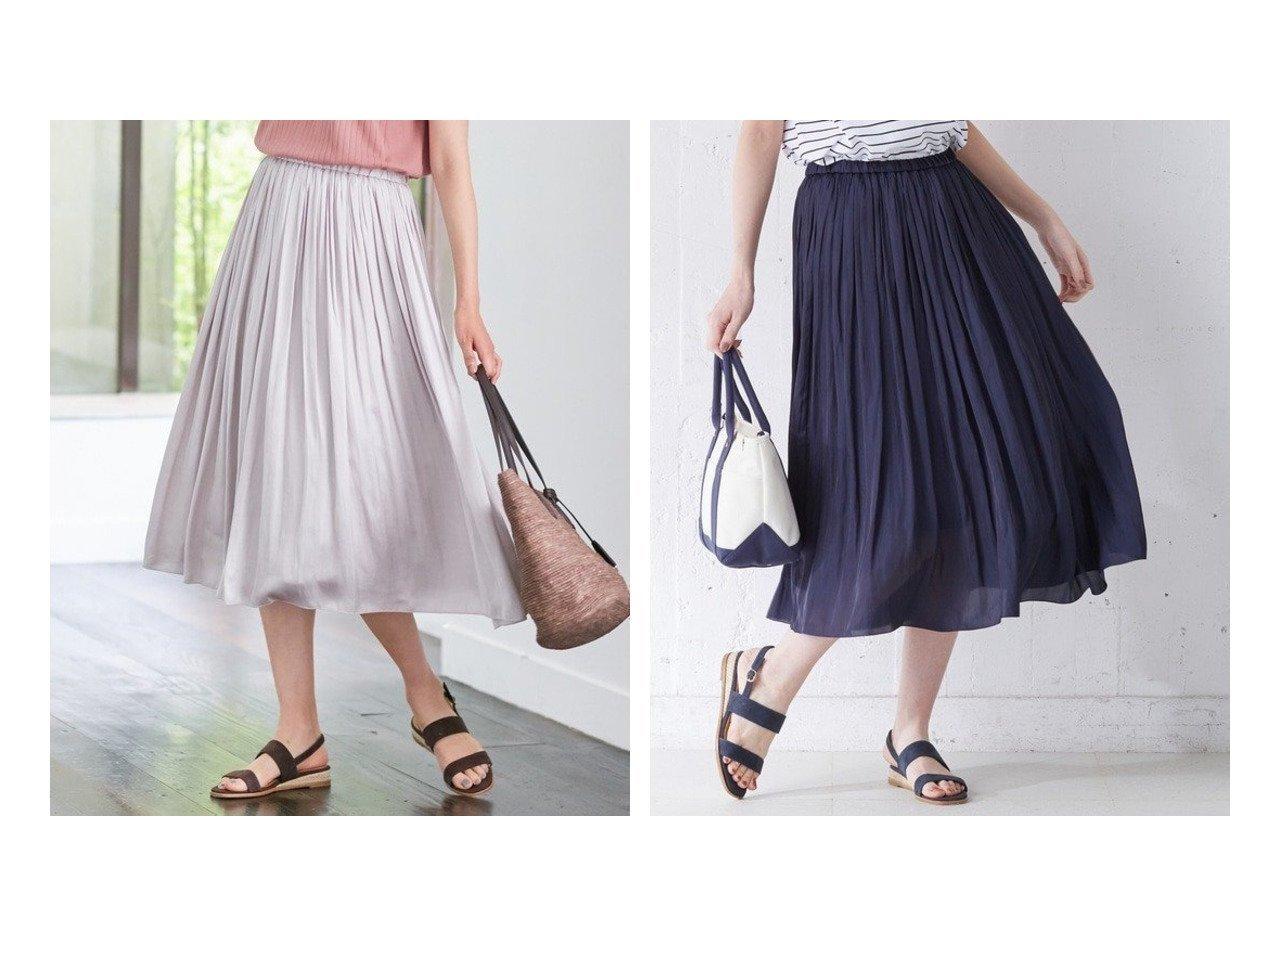 【J.PRESS/ジェイ プレス】の【洗える】ヴィンテージサテン スカート J.PRESSのおすすめ!人気、トレンド・レディースファッションの通販 おすすめで人気の流行・トレンド、ファッションの通販商品 メンズファッション・キッズファッション・インテリア・家具・レディースファッション・服の通販 founy(ファニー) https://founy.com/ ファッション Fashion レディースファッション WOMEN スカート Skirt 送料無料 Free Shipping シャンブレー シンプル プリーツ リラックス 洗える |ID:crp329100000020344